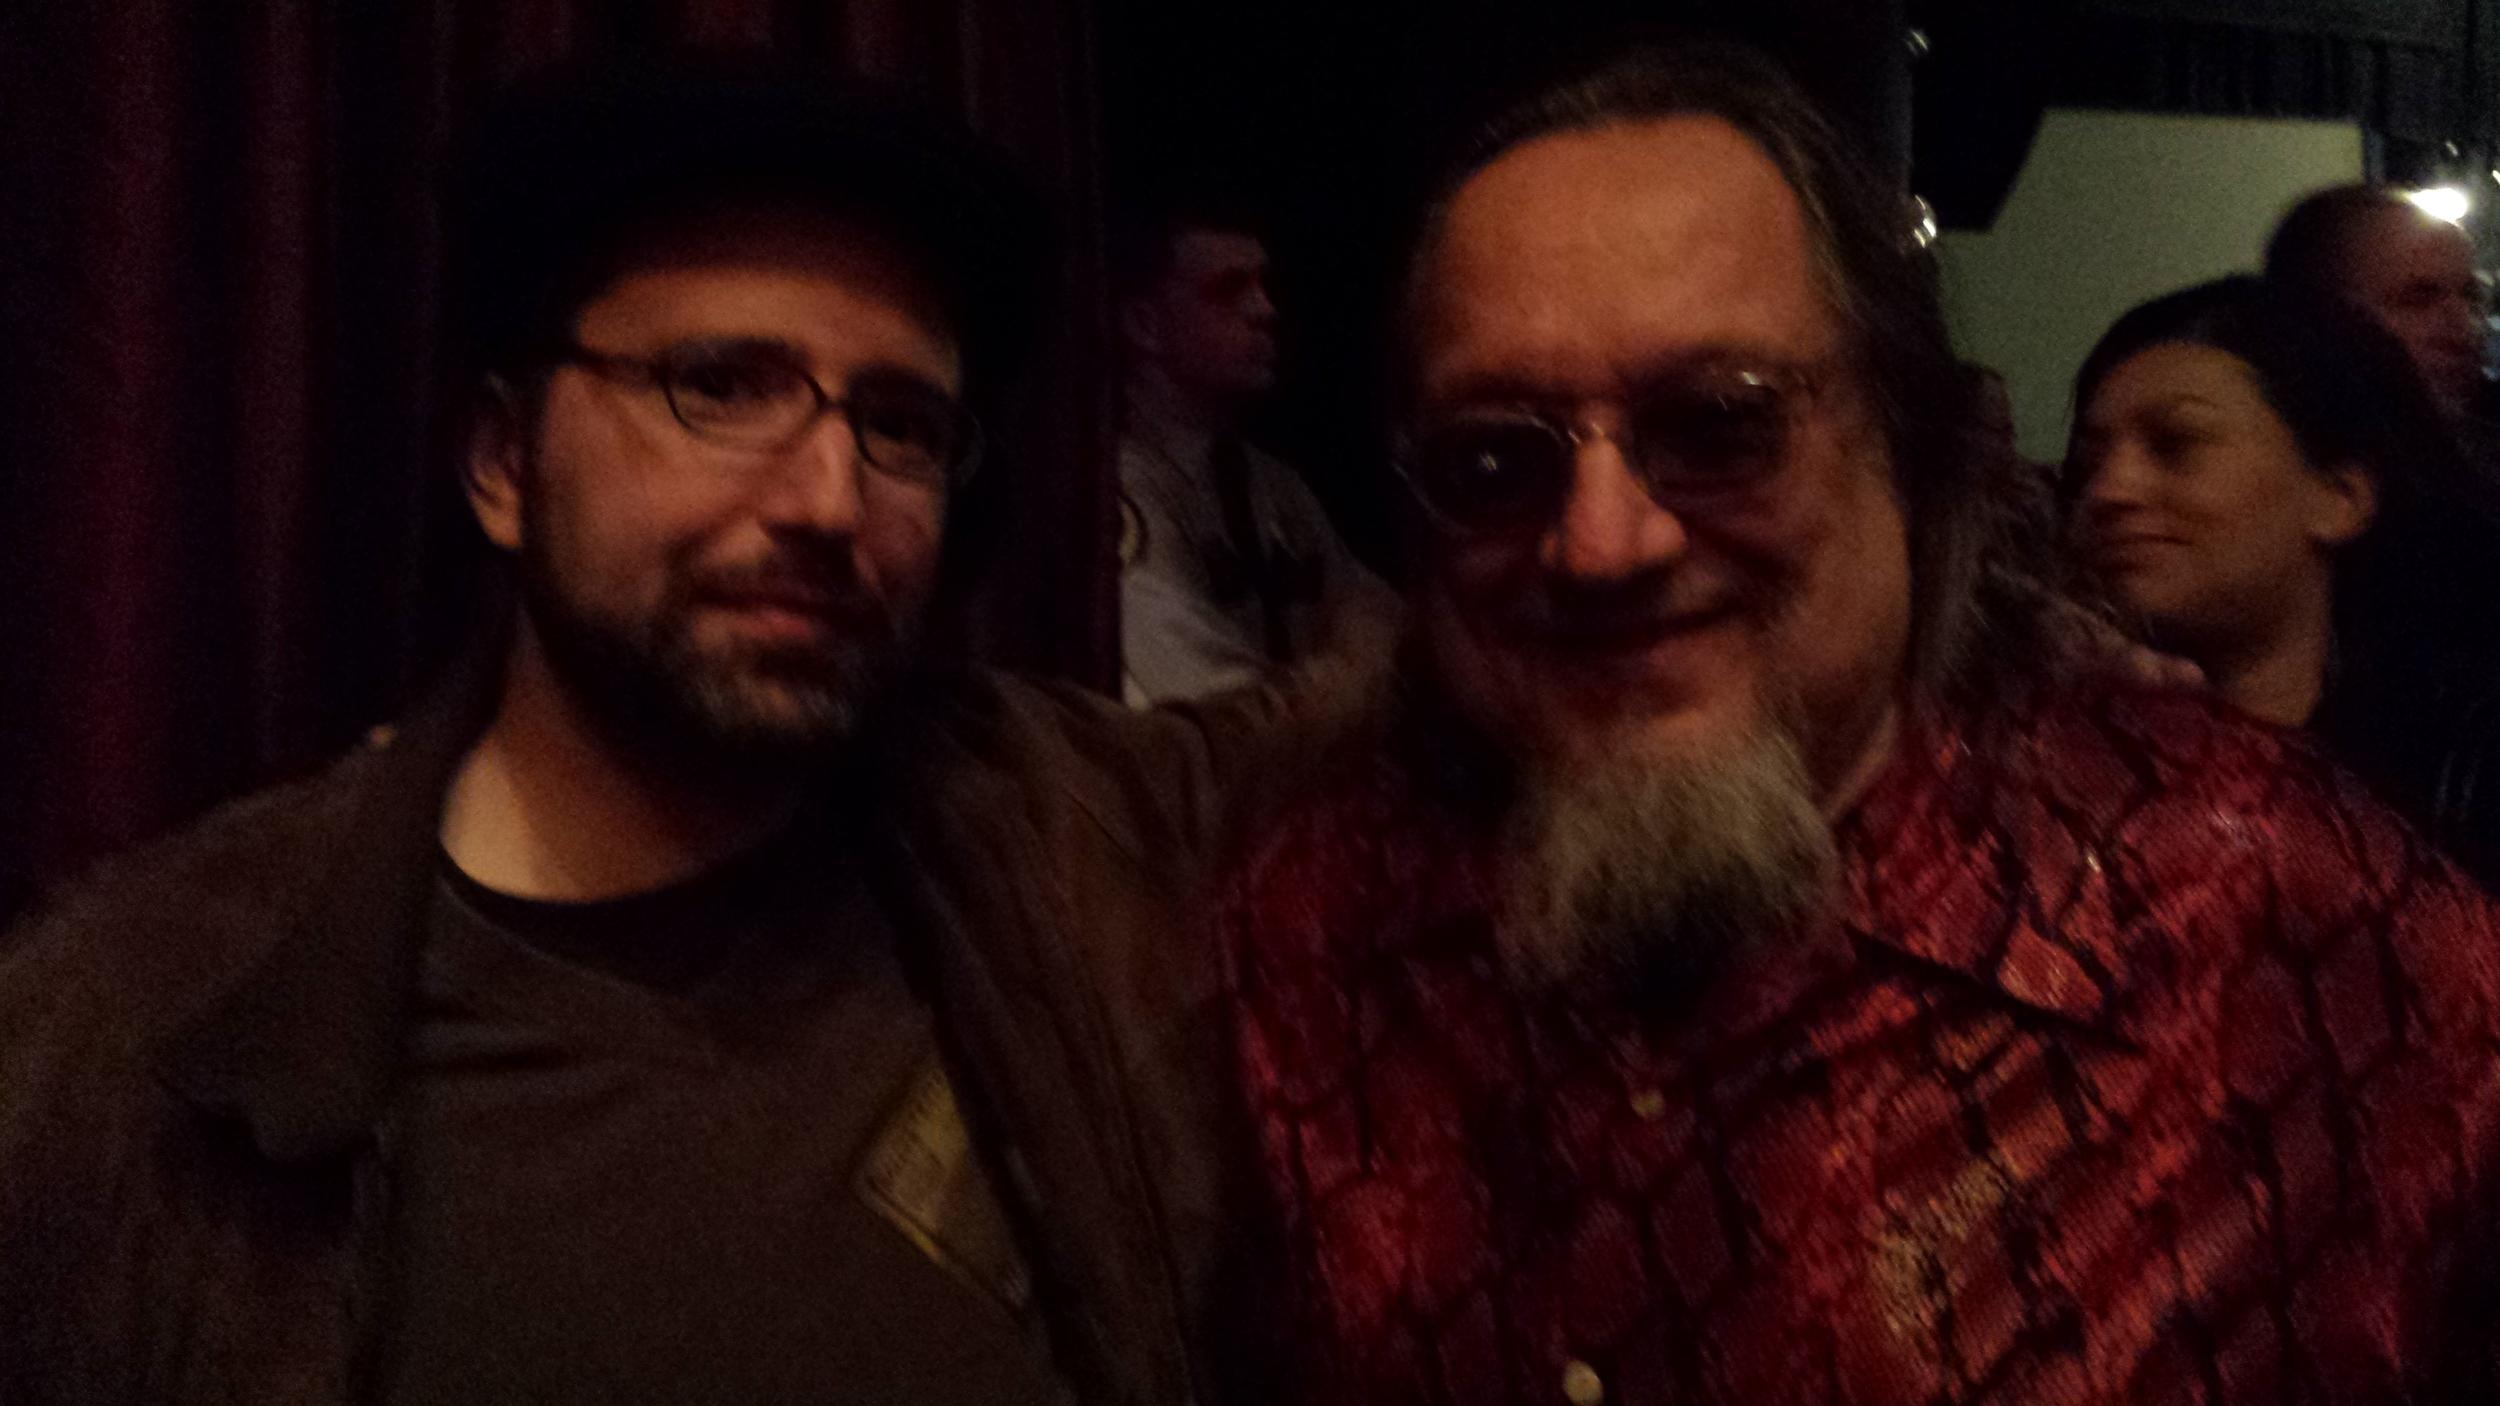 Jeff Schwachter with Larry Sloman, Caesars Atlantic City, Feb. 2014